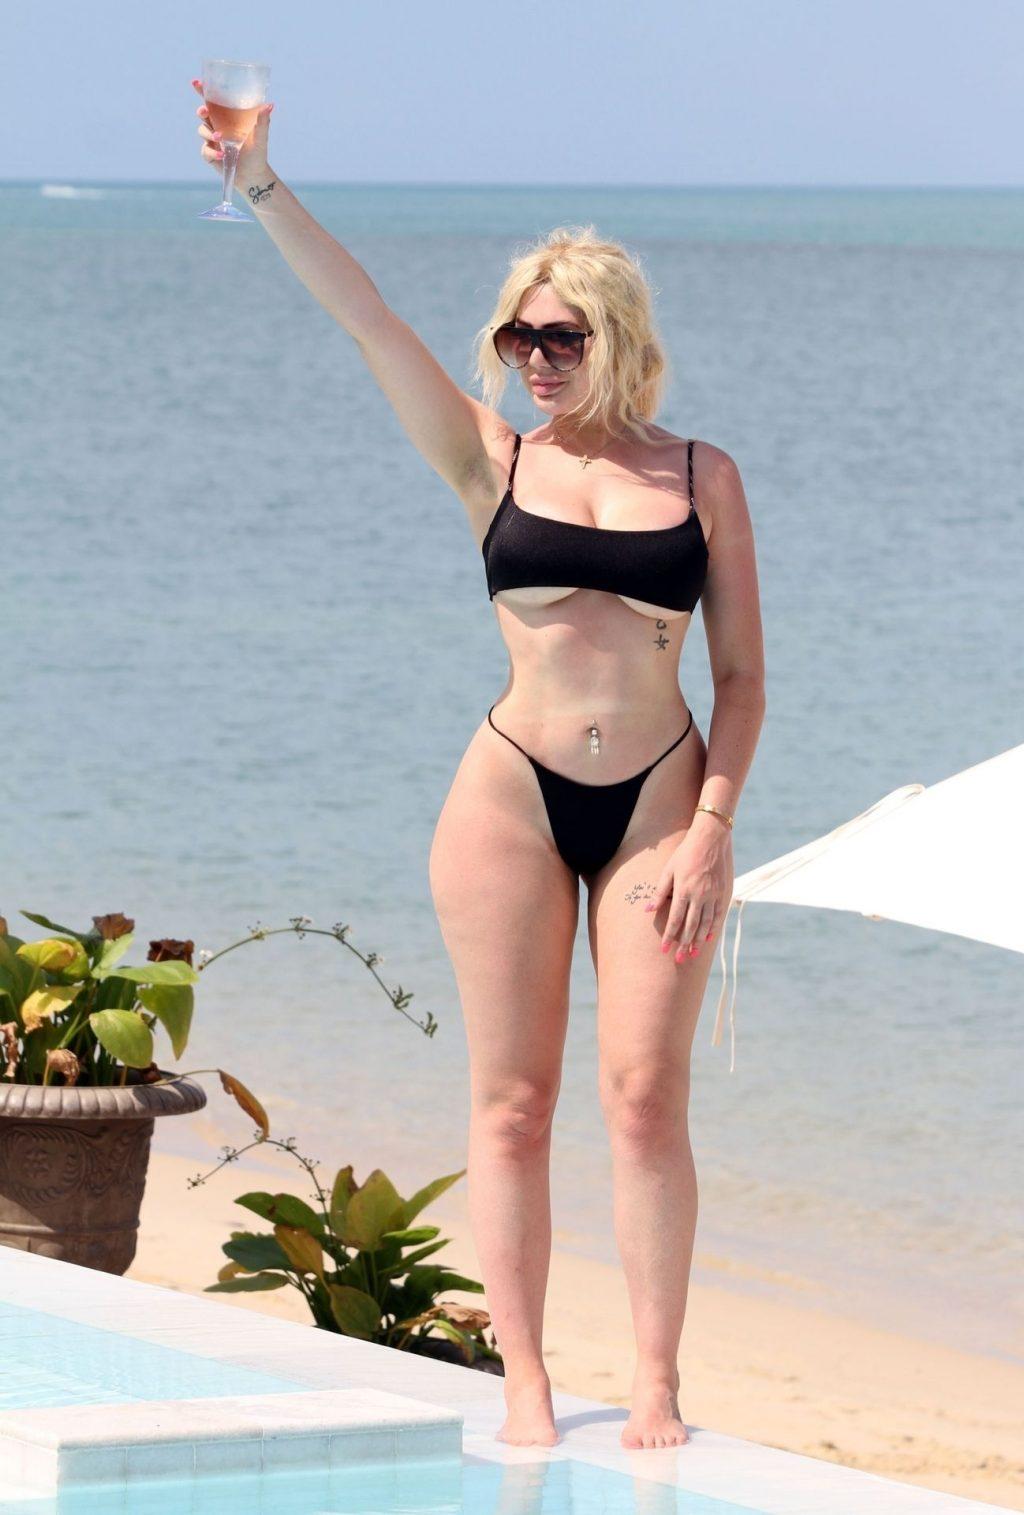 Chloe Ferry's Underboob & Butt (51 Photos)